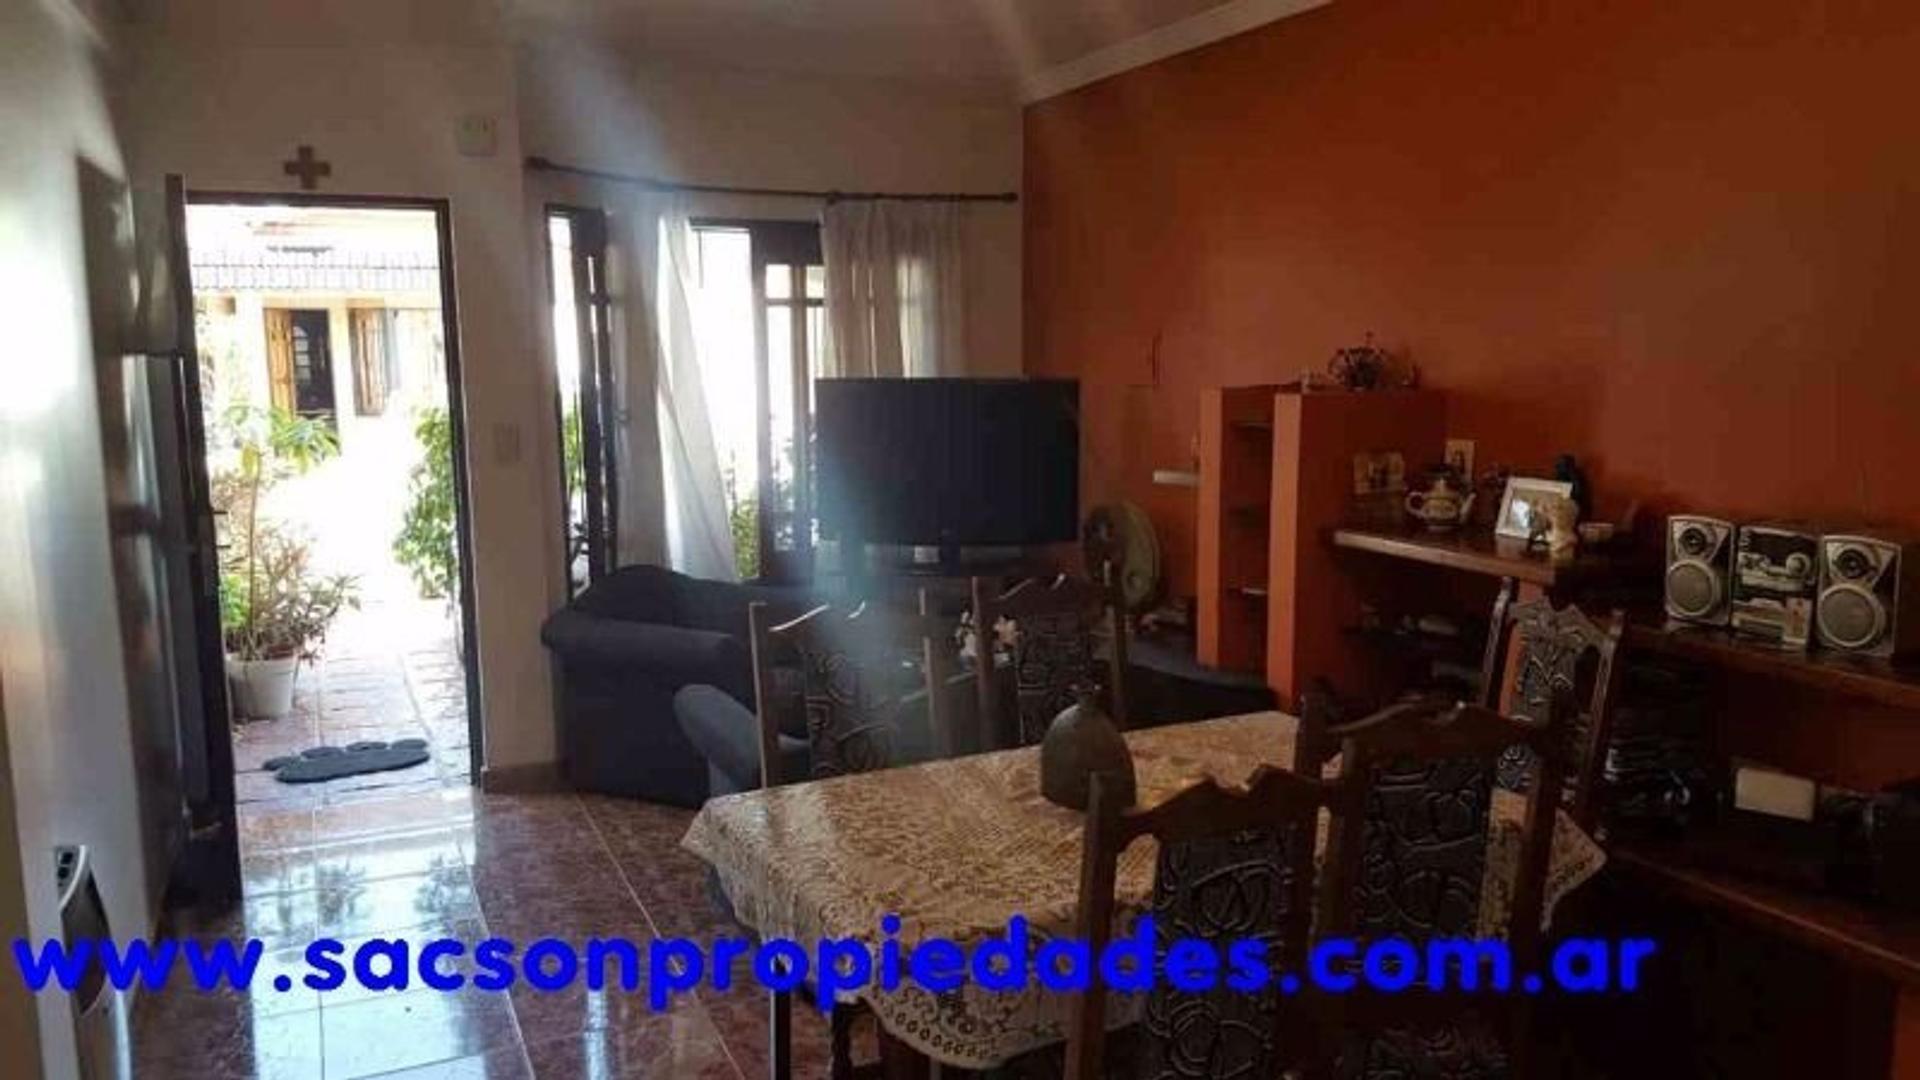 V546 Haedo Duplex 3 amb. con cochera - Consultas: tel 4656-0788